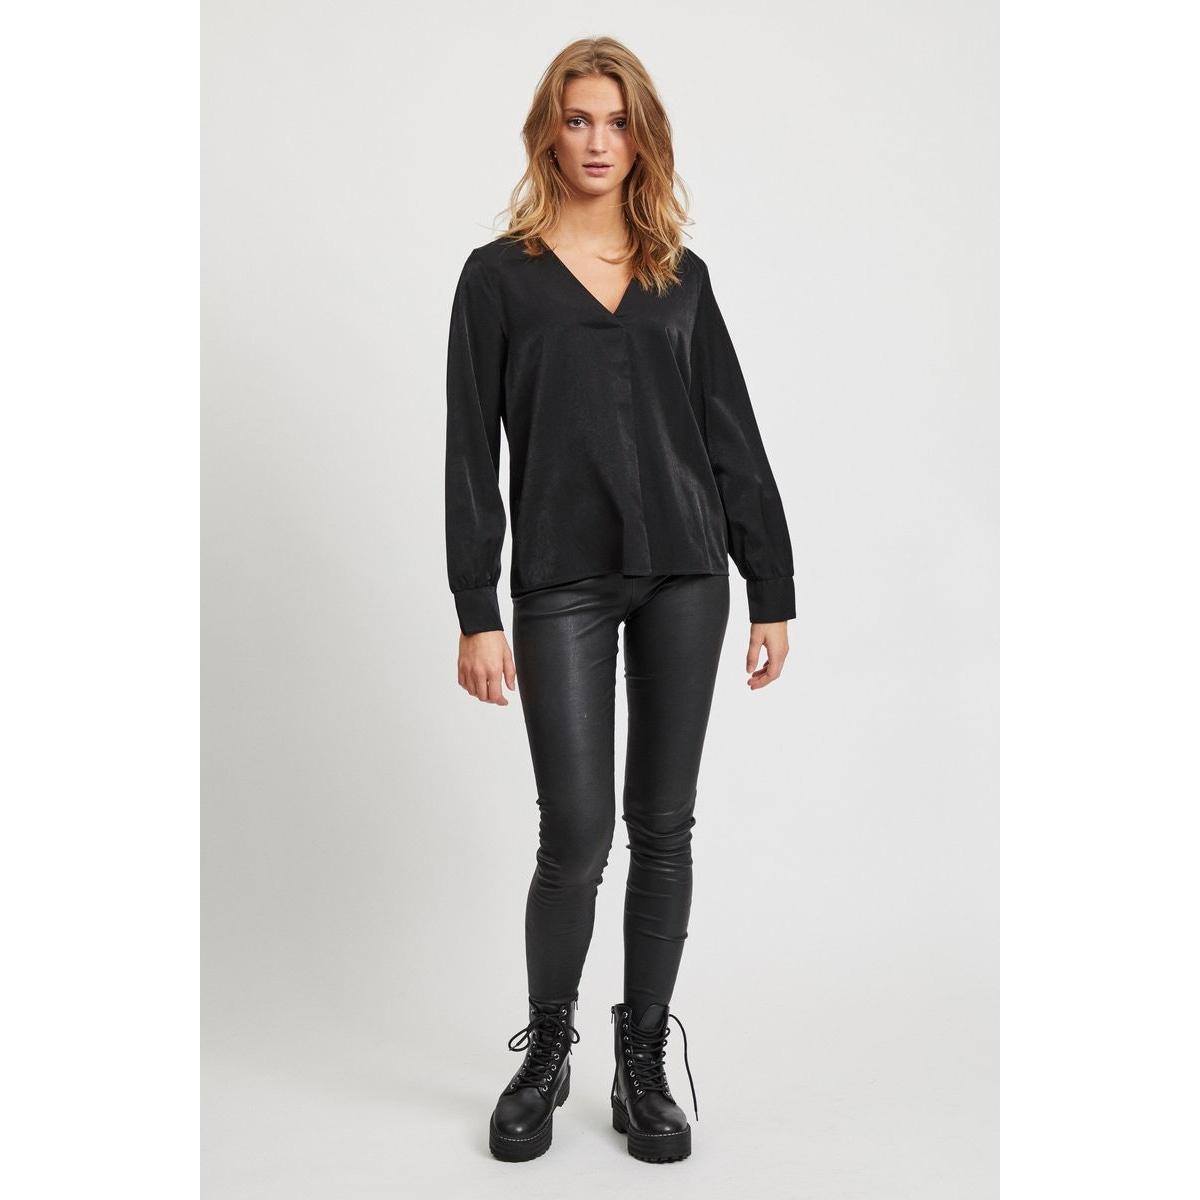 objeileen l/s v-neck top noos 23032114 object blouse black